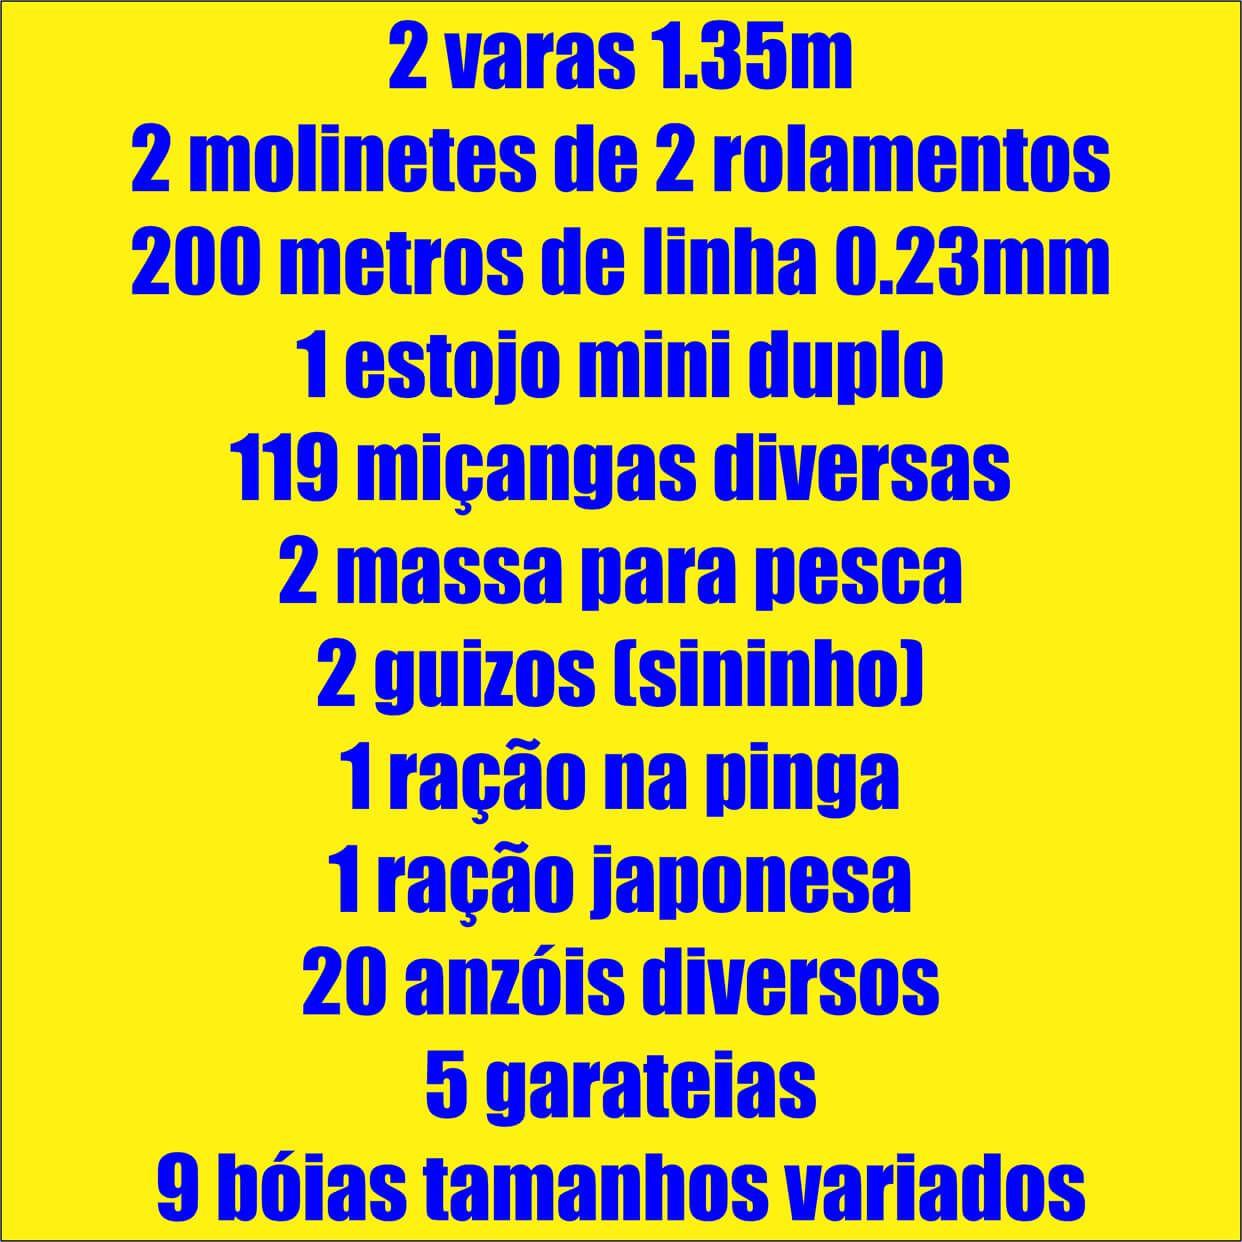 Kit De Pesquerio E Represa 2 Varas 2 Molinetes + Acessórios